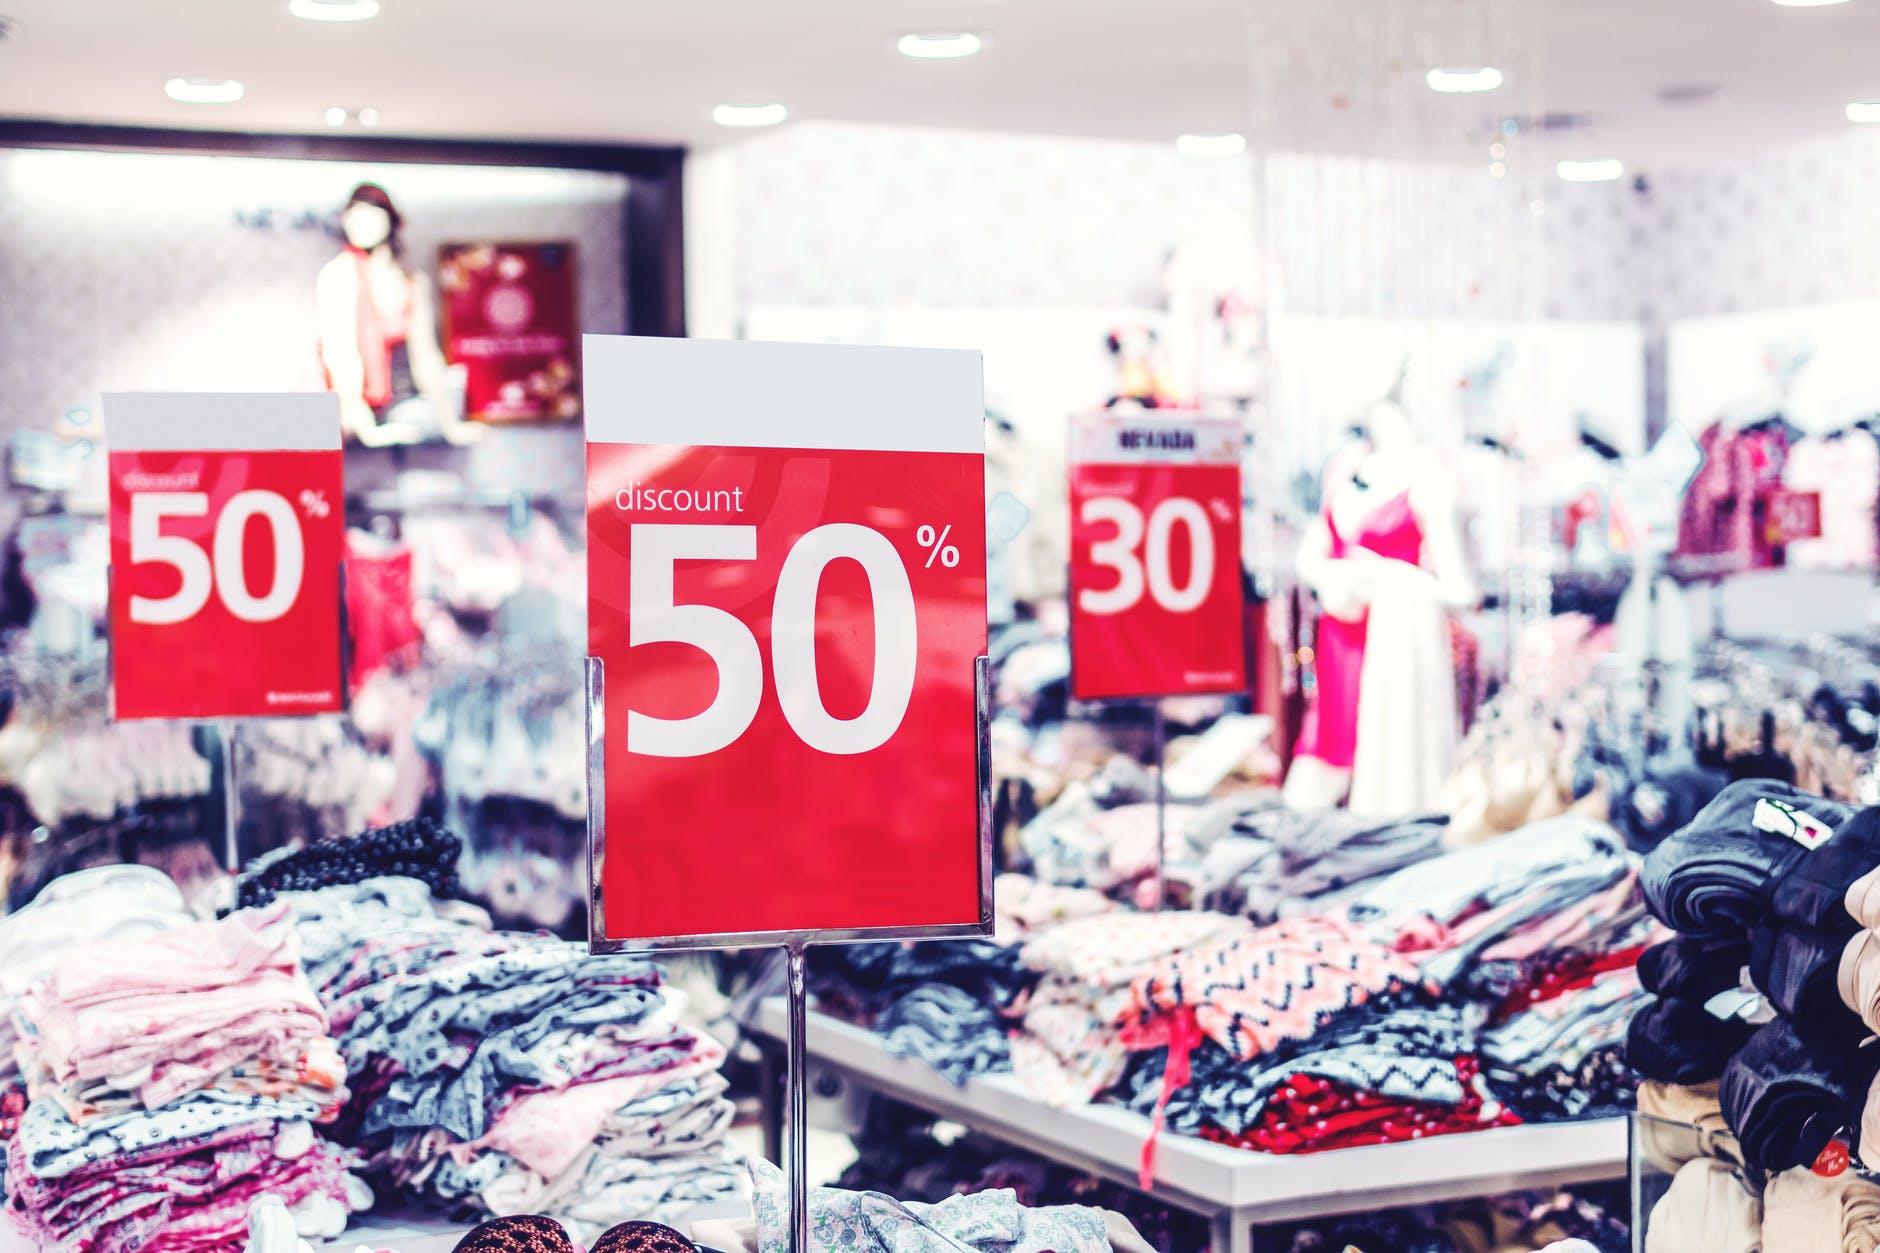 retail merchandise